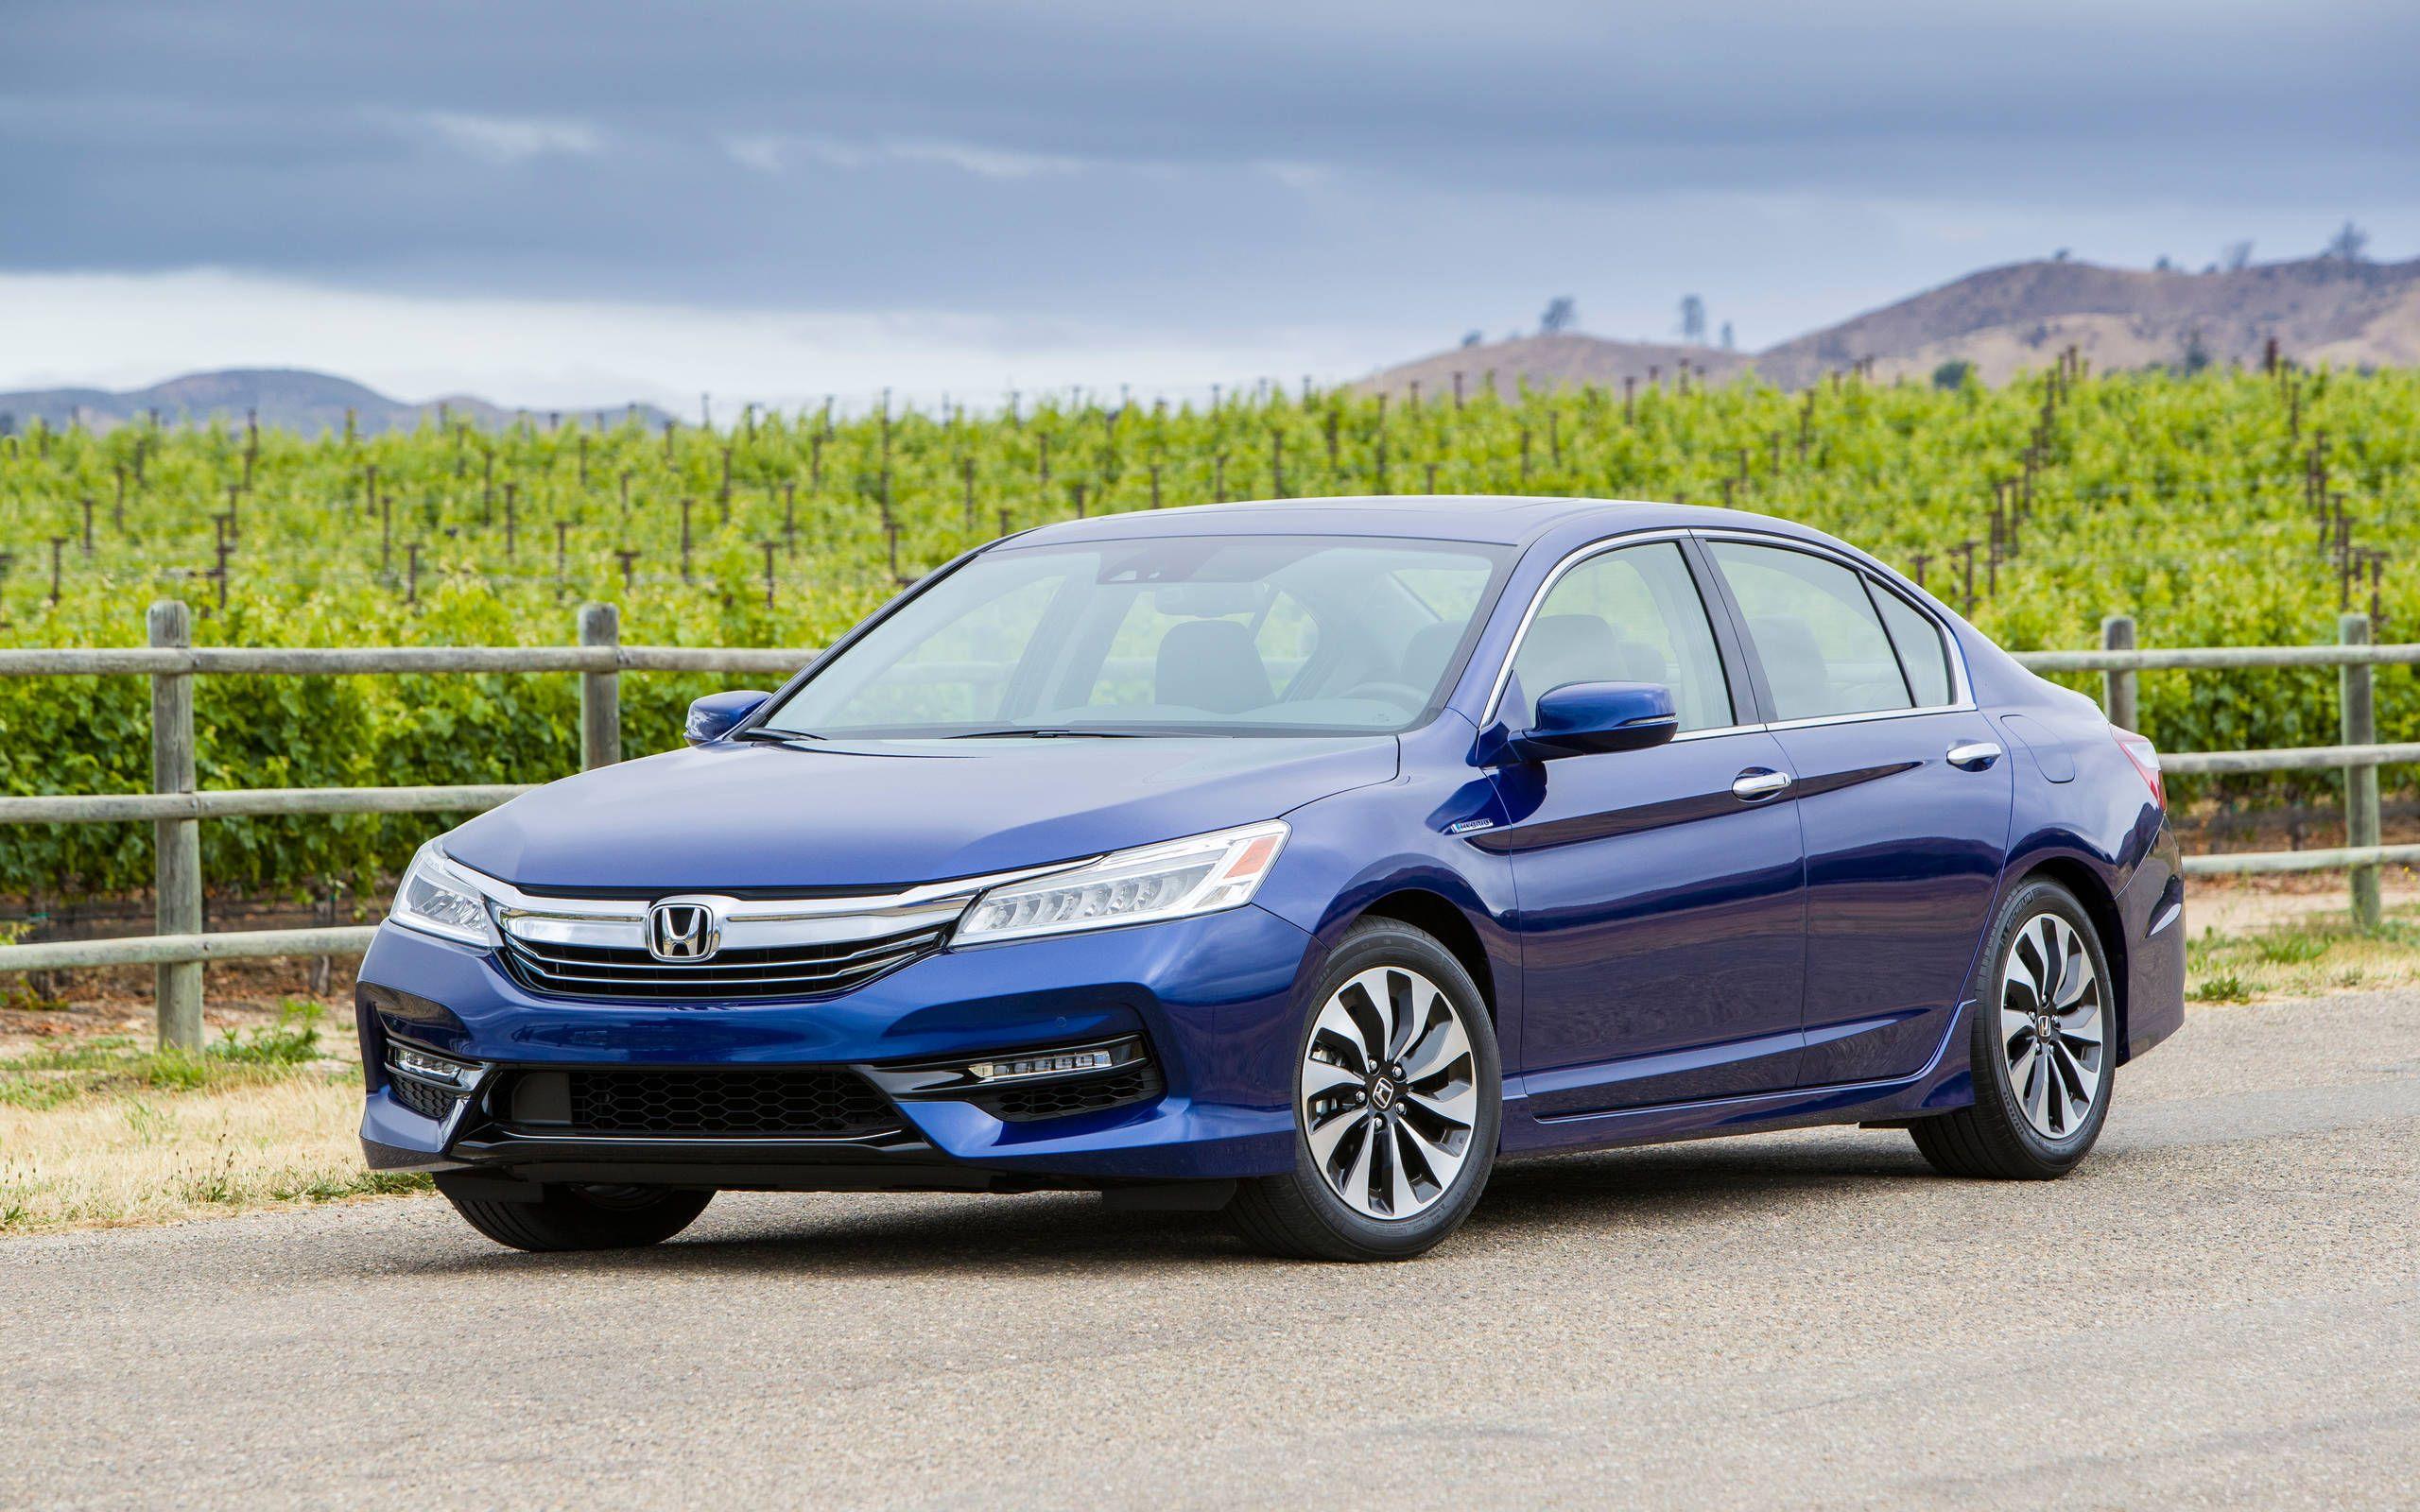 2017 Honda Accord Hybrid Touring Drive Review The Non Hybrid Hybrid